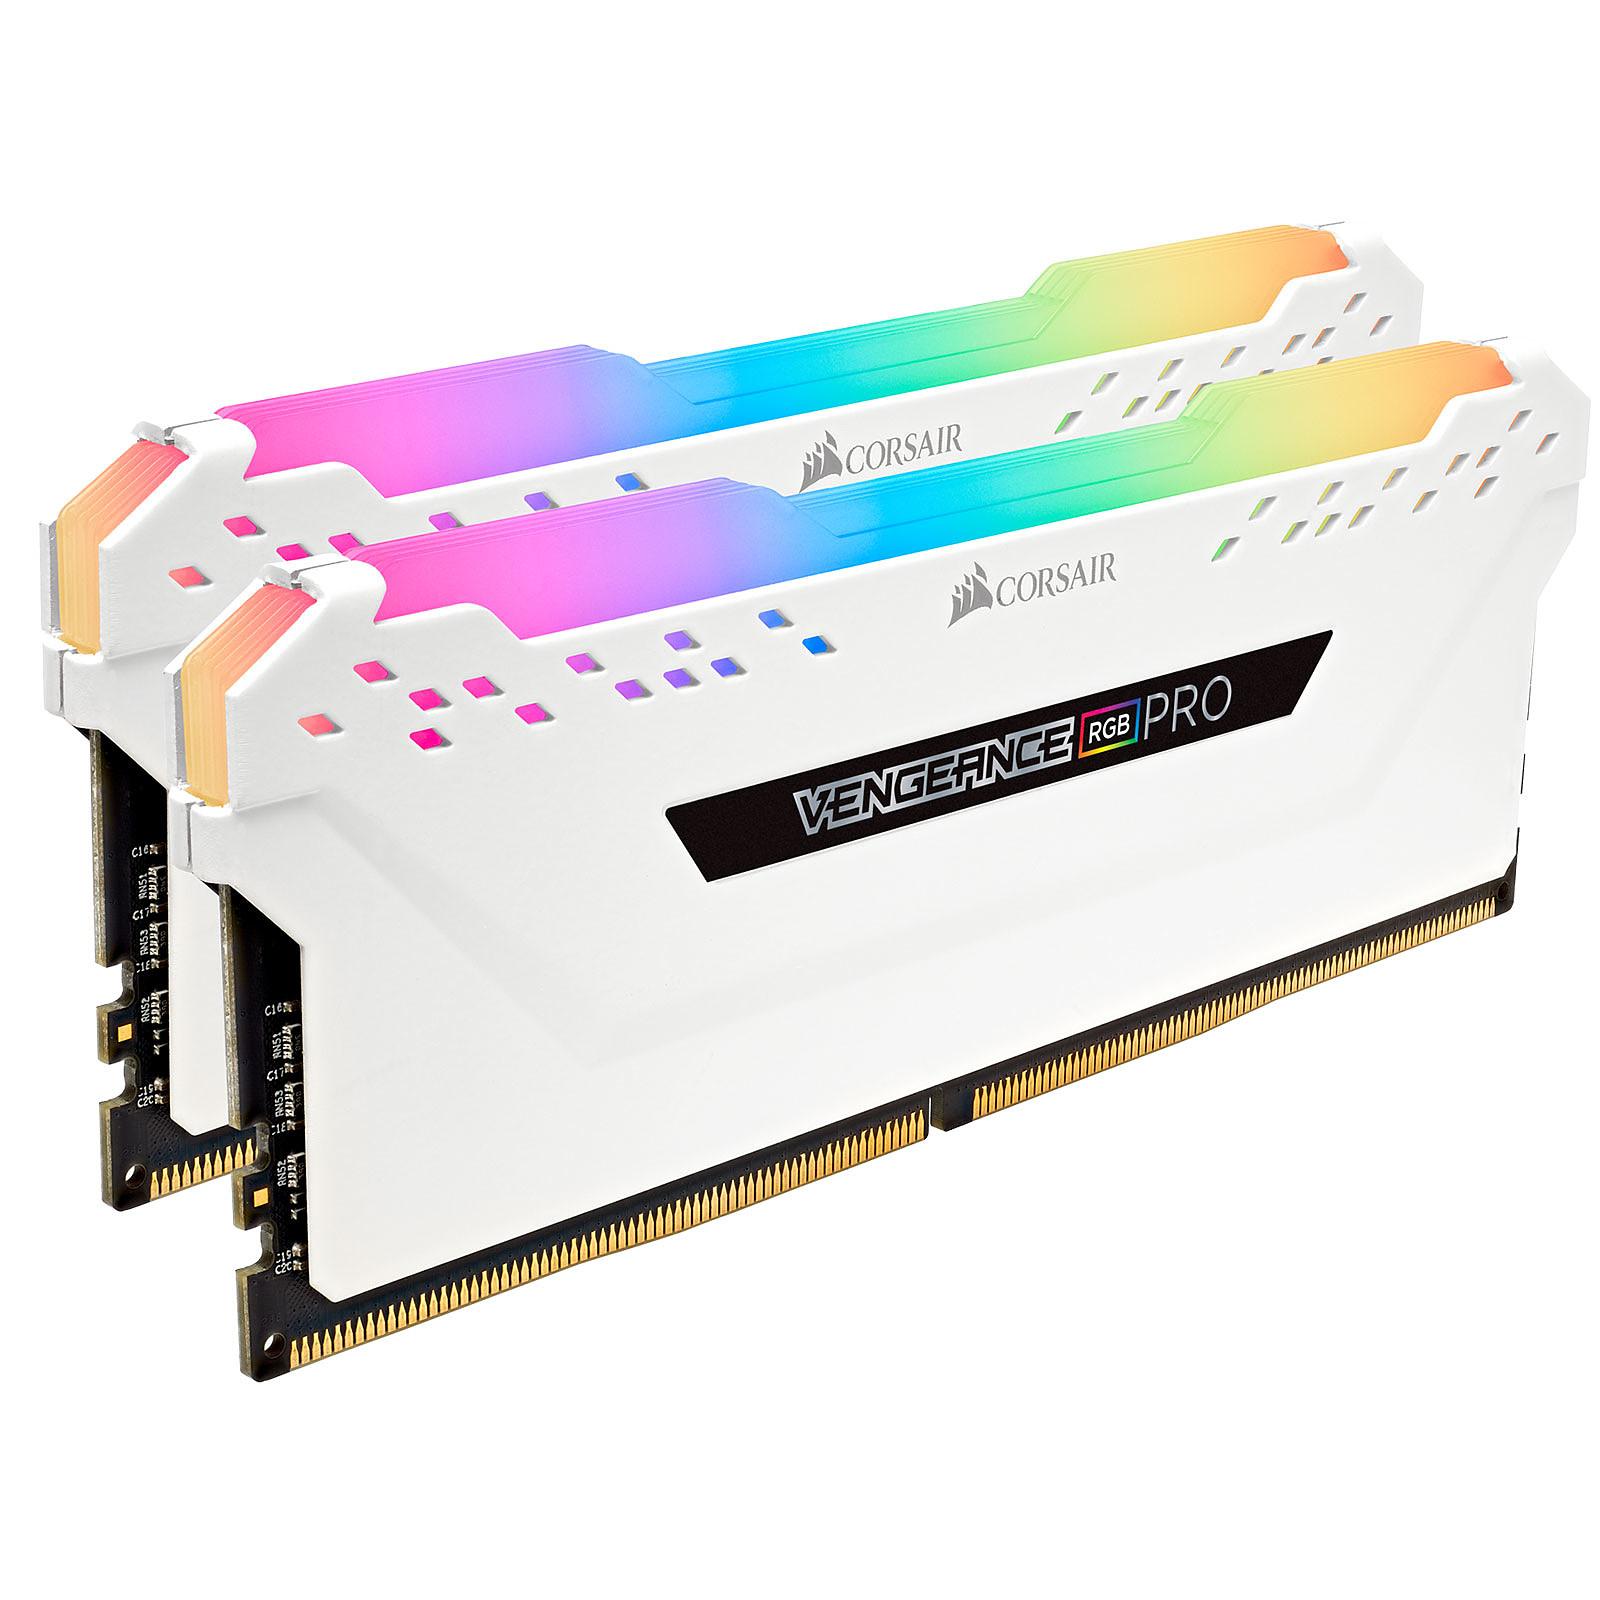 Corsair Vengeance RGB PRO Series 16 GB (2x 8 GB) DDR4 3600 MHz CL18